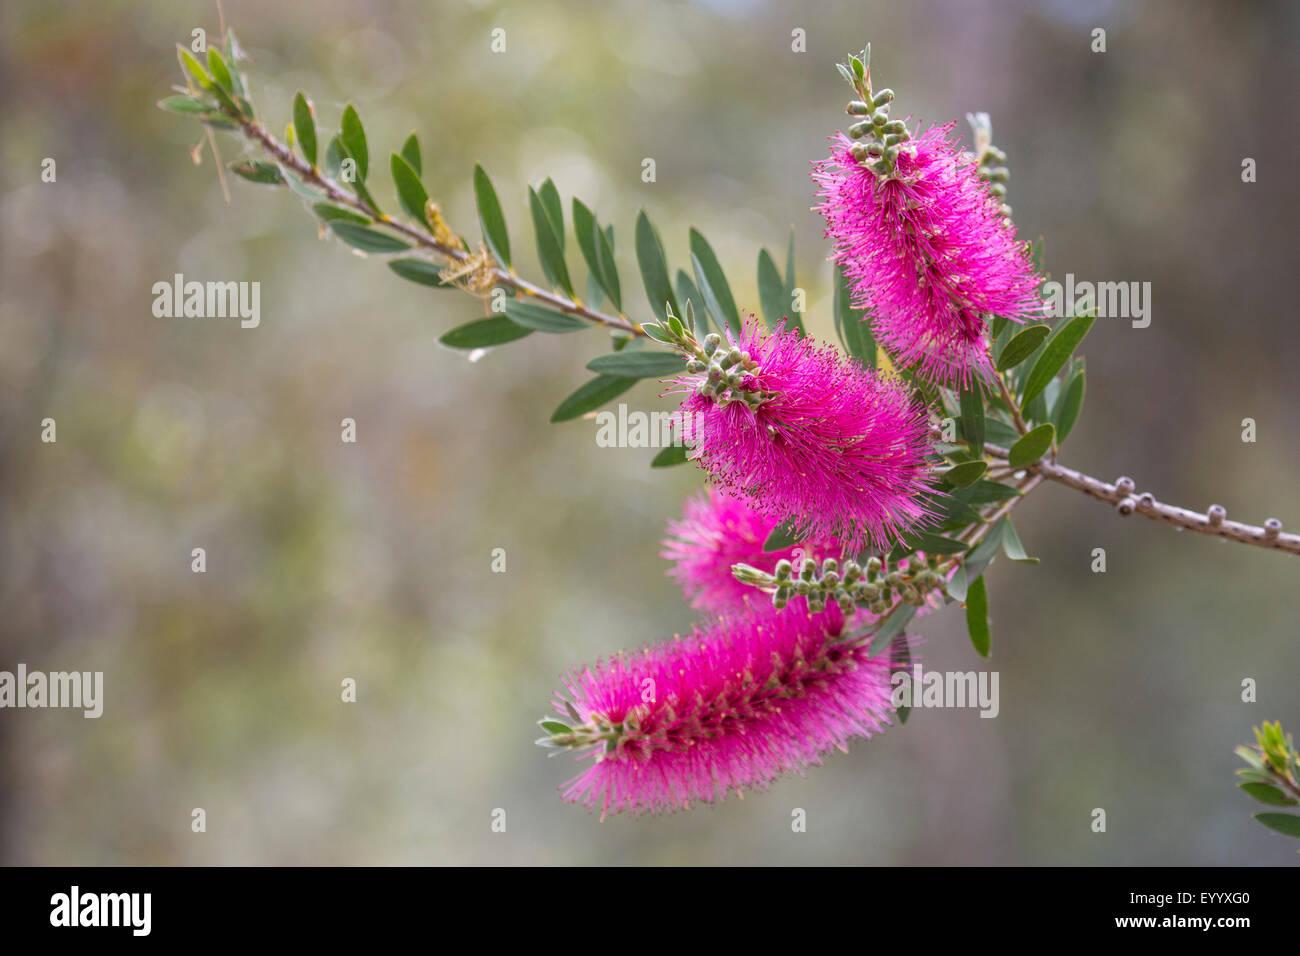 Crimson bottlebrush (Callistemon citrinus), inflorescences, USA, Arizona, Boyce Thompson Arboretum - Stock Image